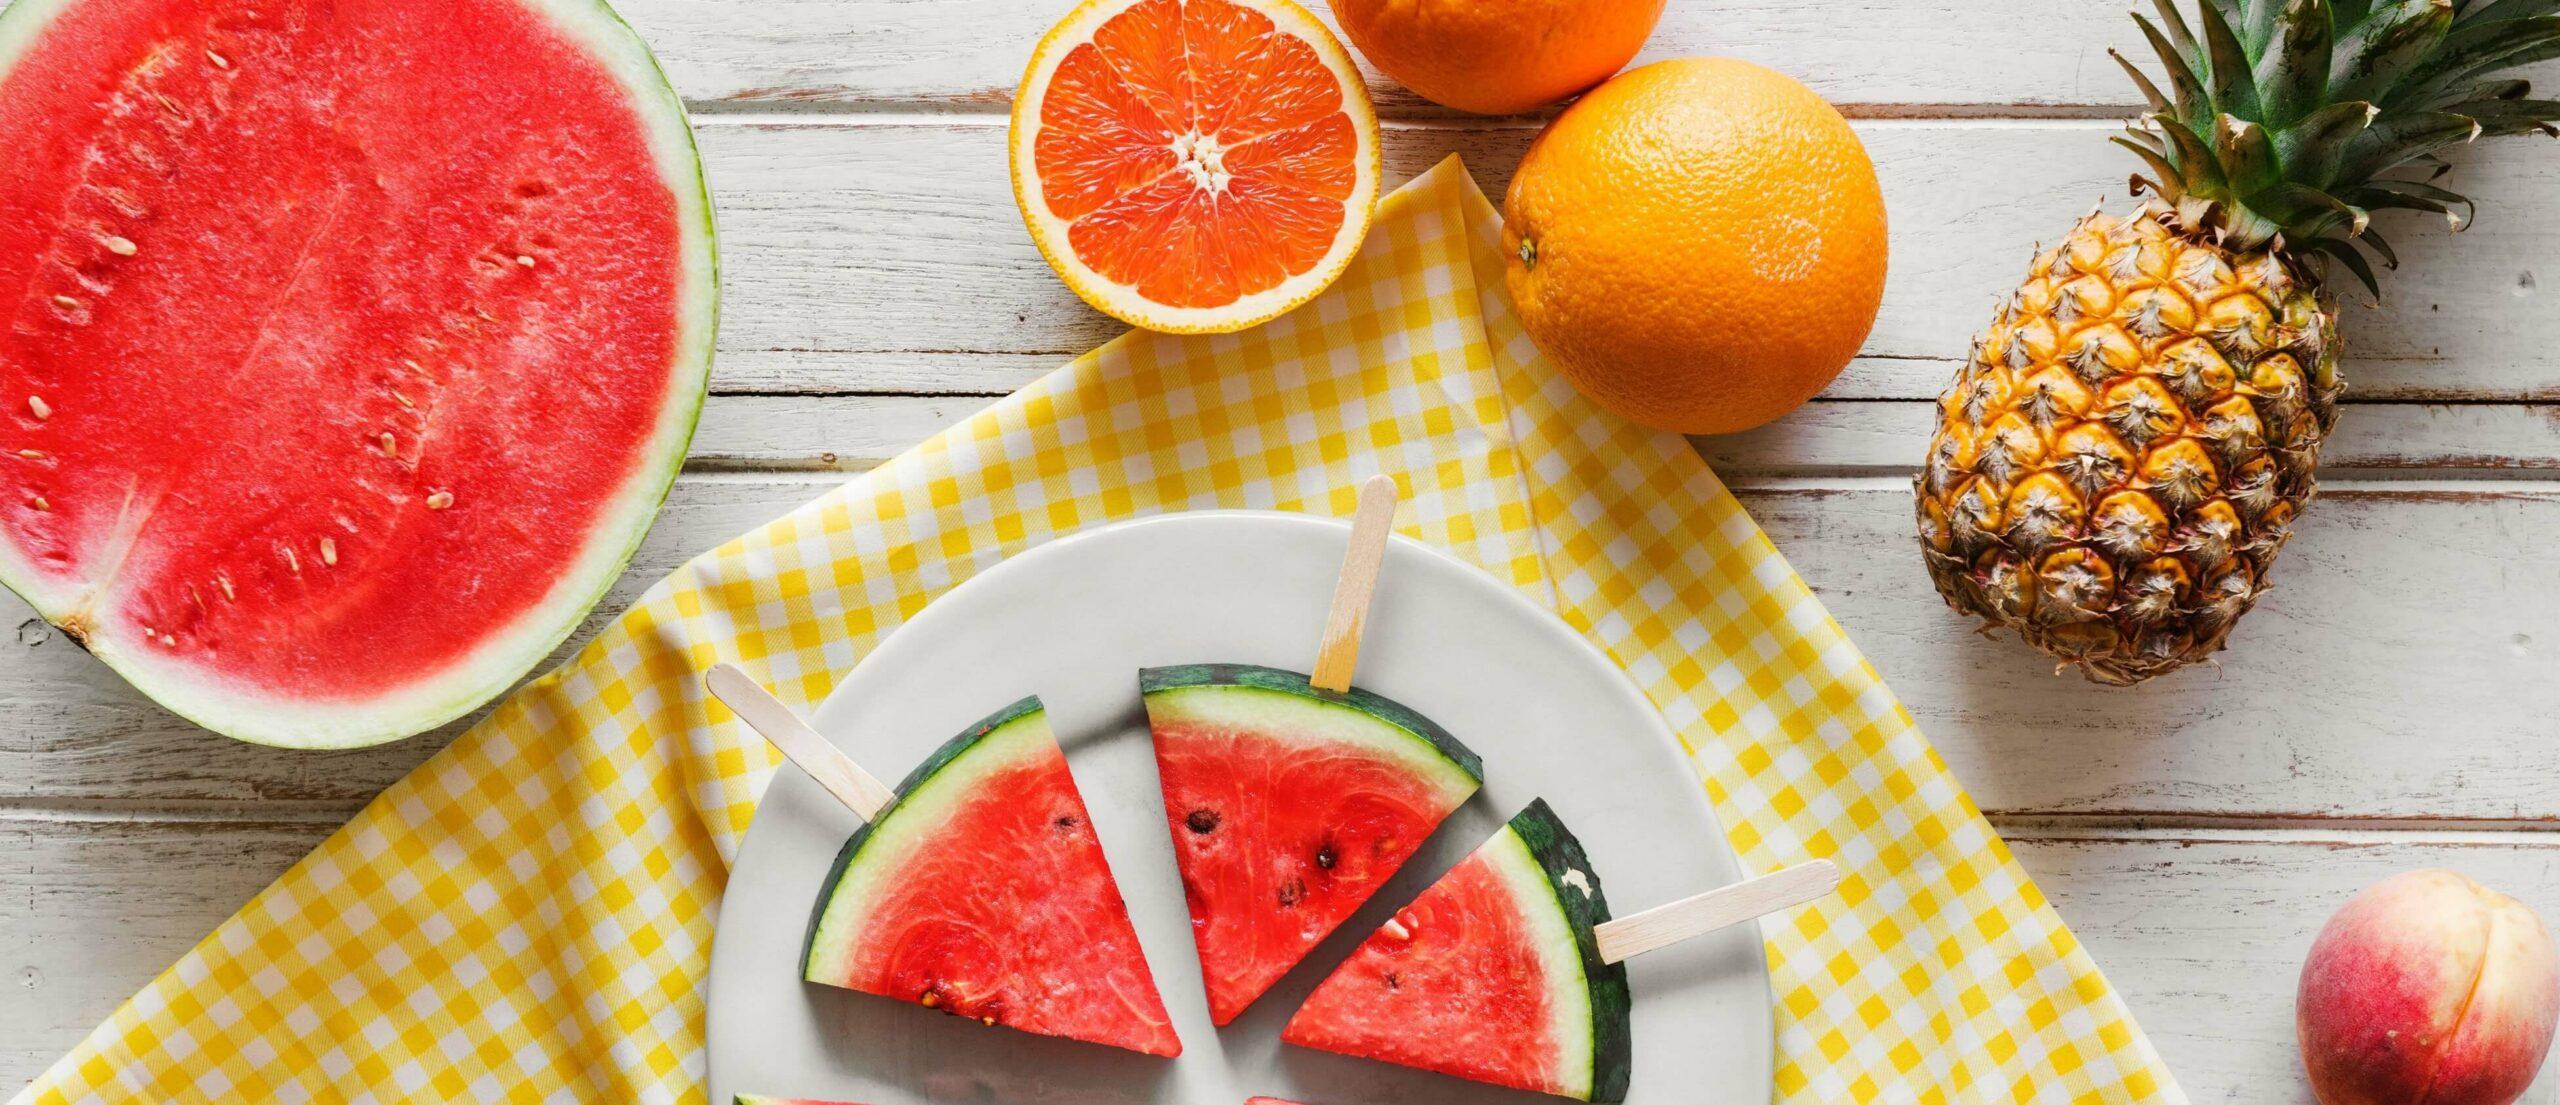 Zomers fruit op tafel